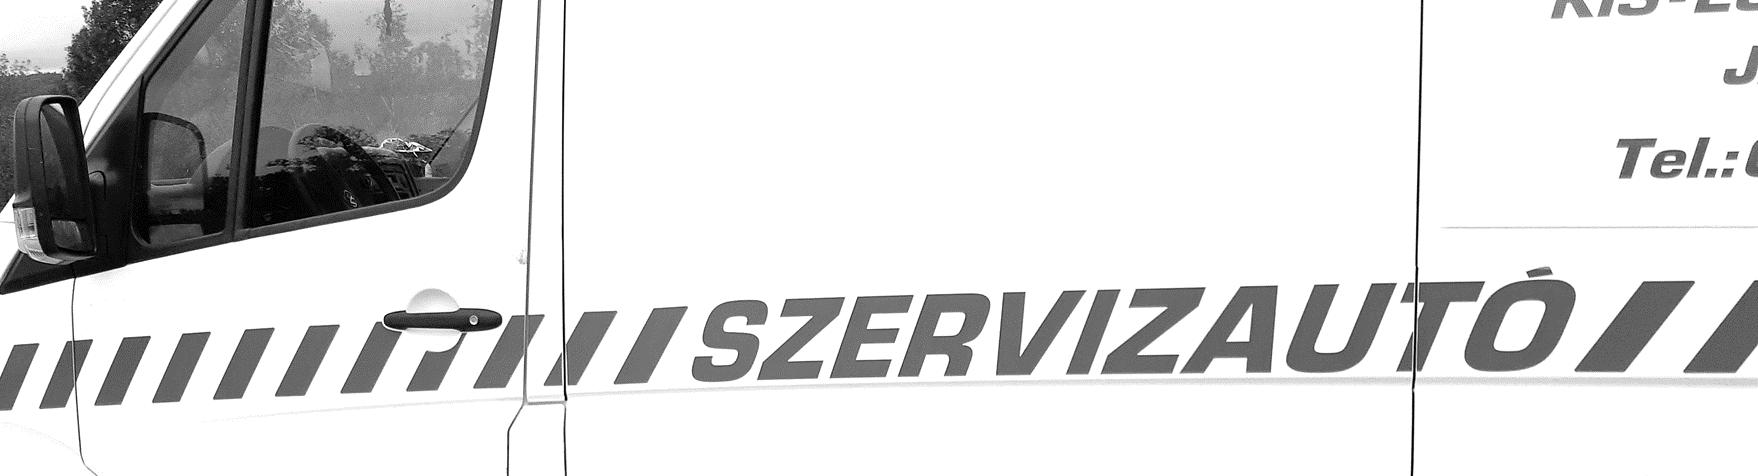 Service Techniker Ersatzteil-Bestand optimieren